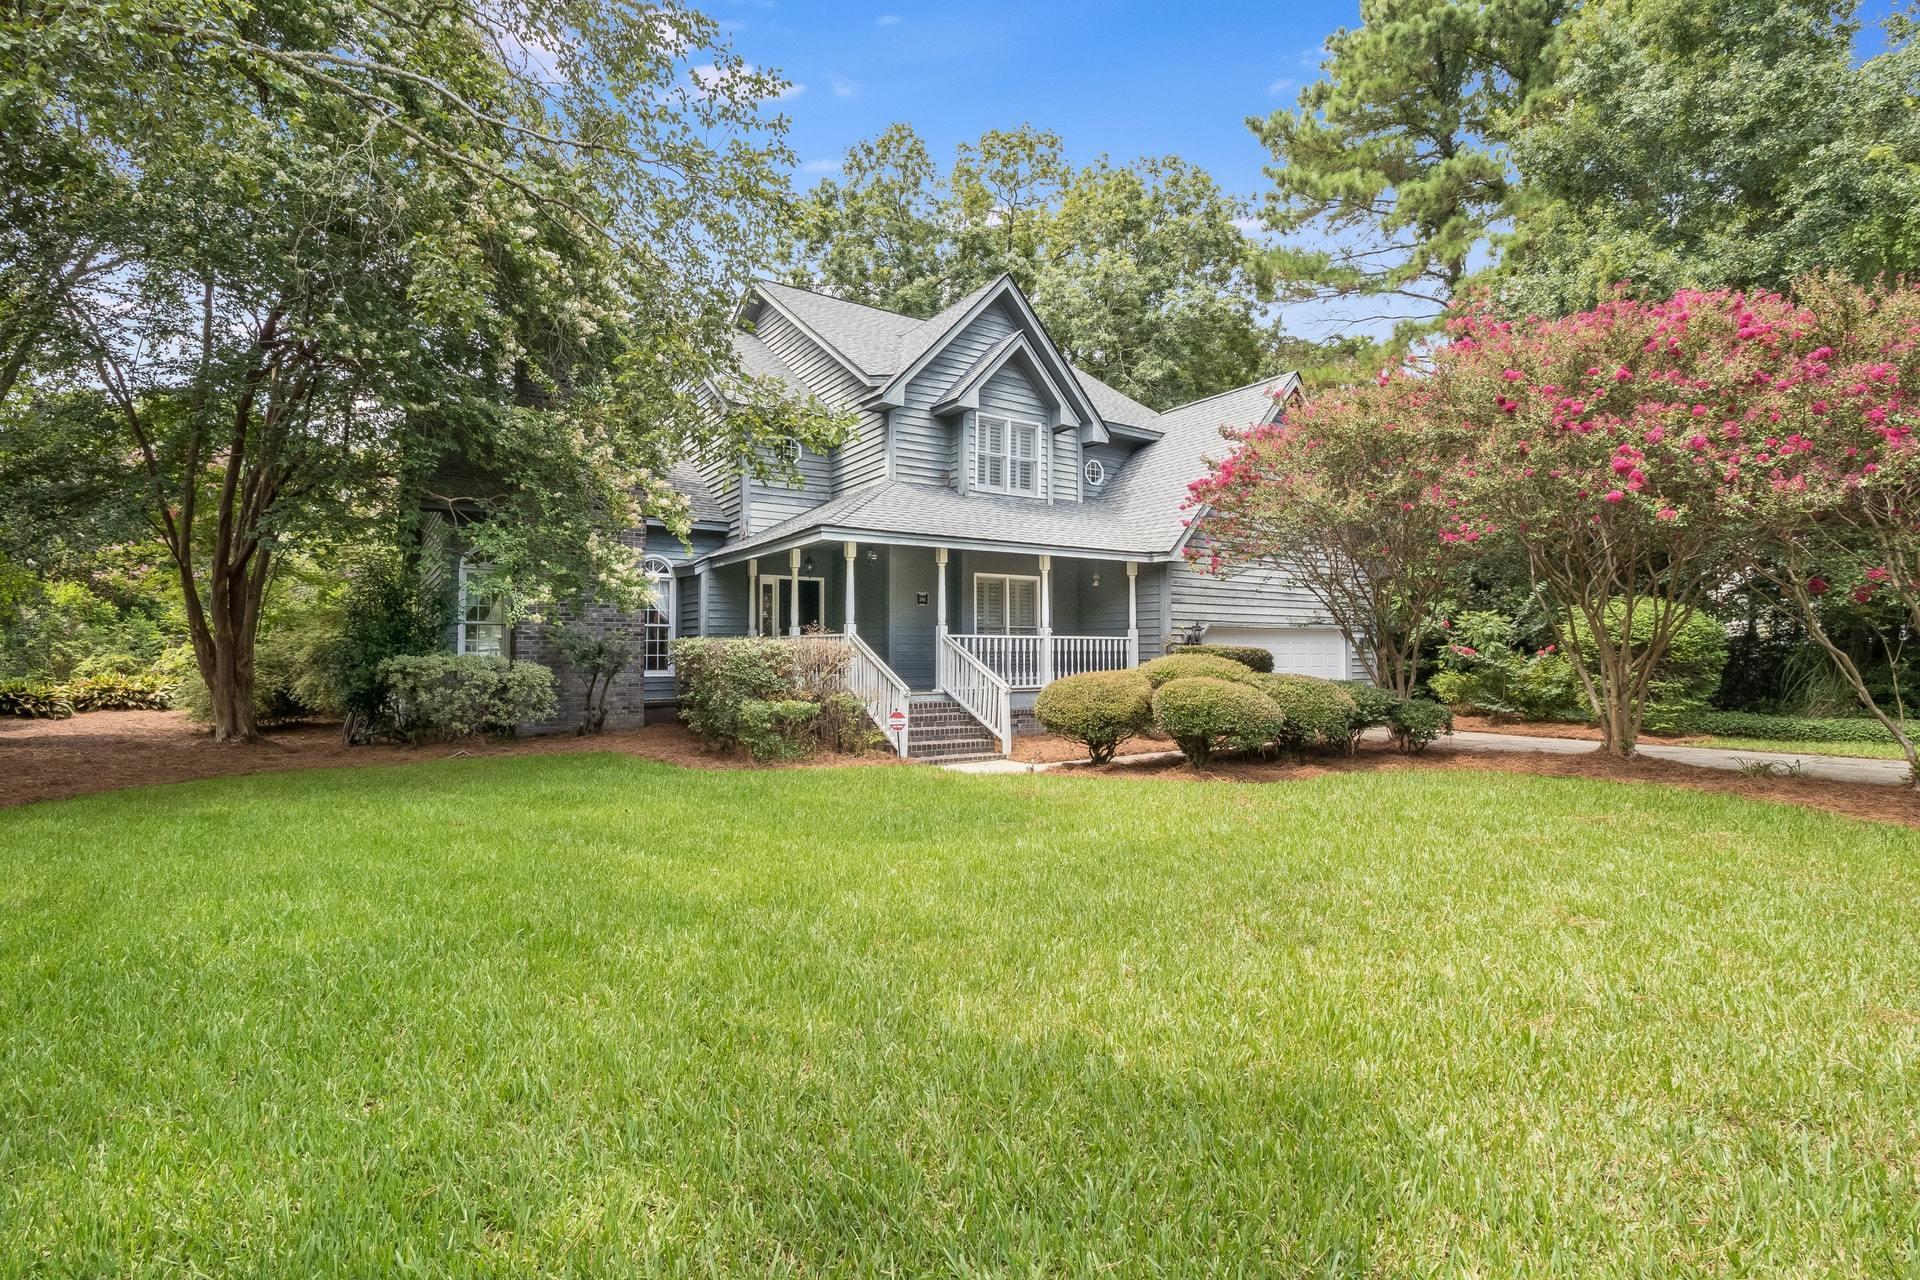 Molasses Creek Homes For Sale - 396 Sirop, Mount Pleasant, SC - 9